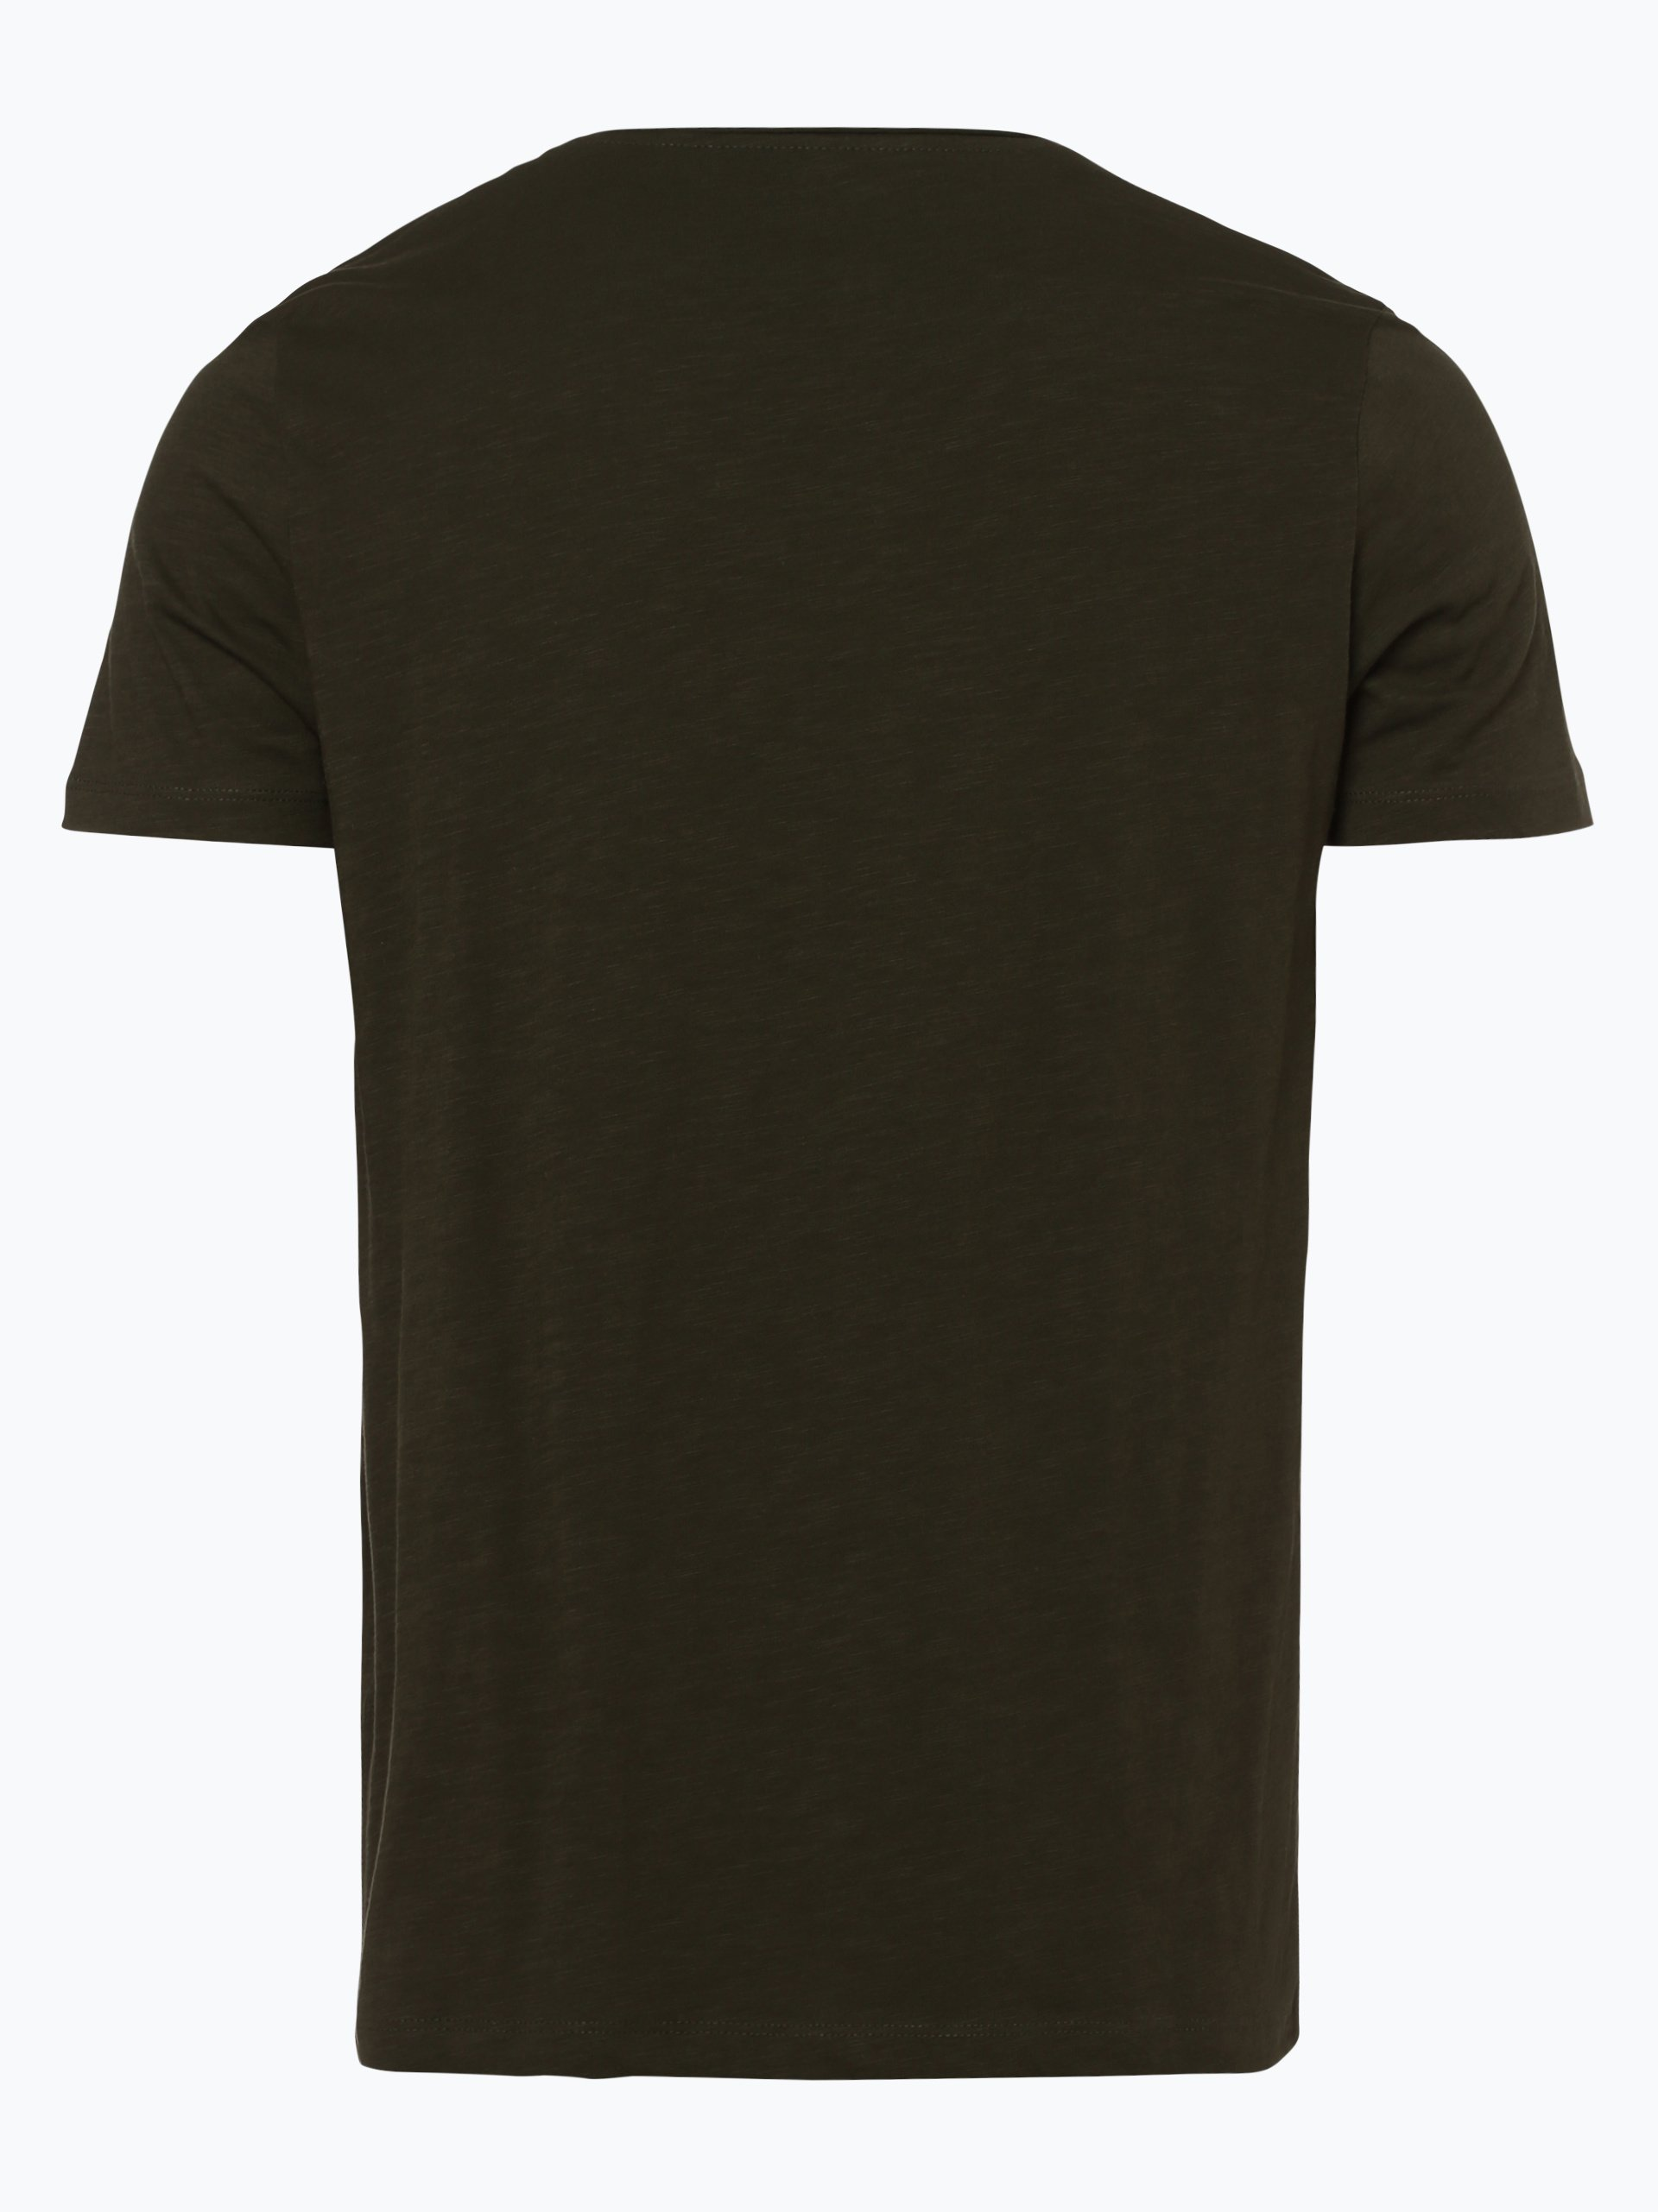 tom tailor denim herren t shirt oliv gemustert online. Black Bedroom Furniture Sets. Home Design Ideas